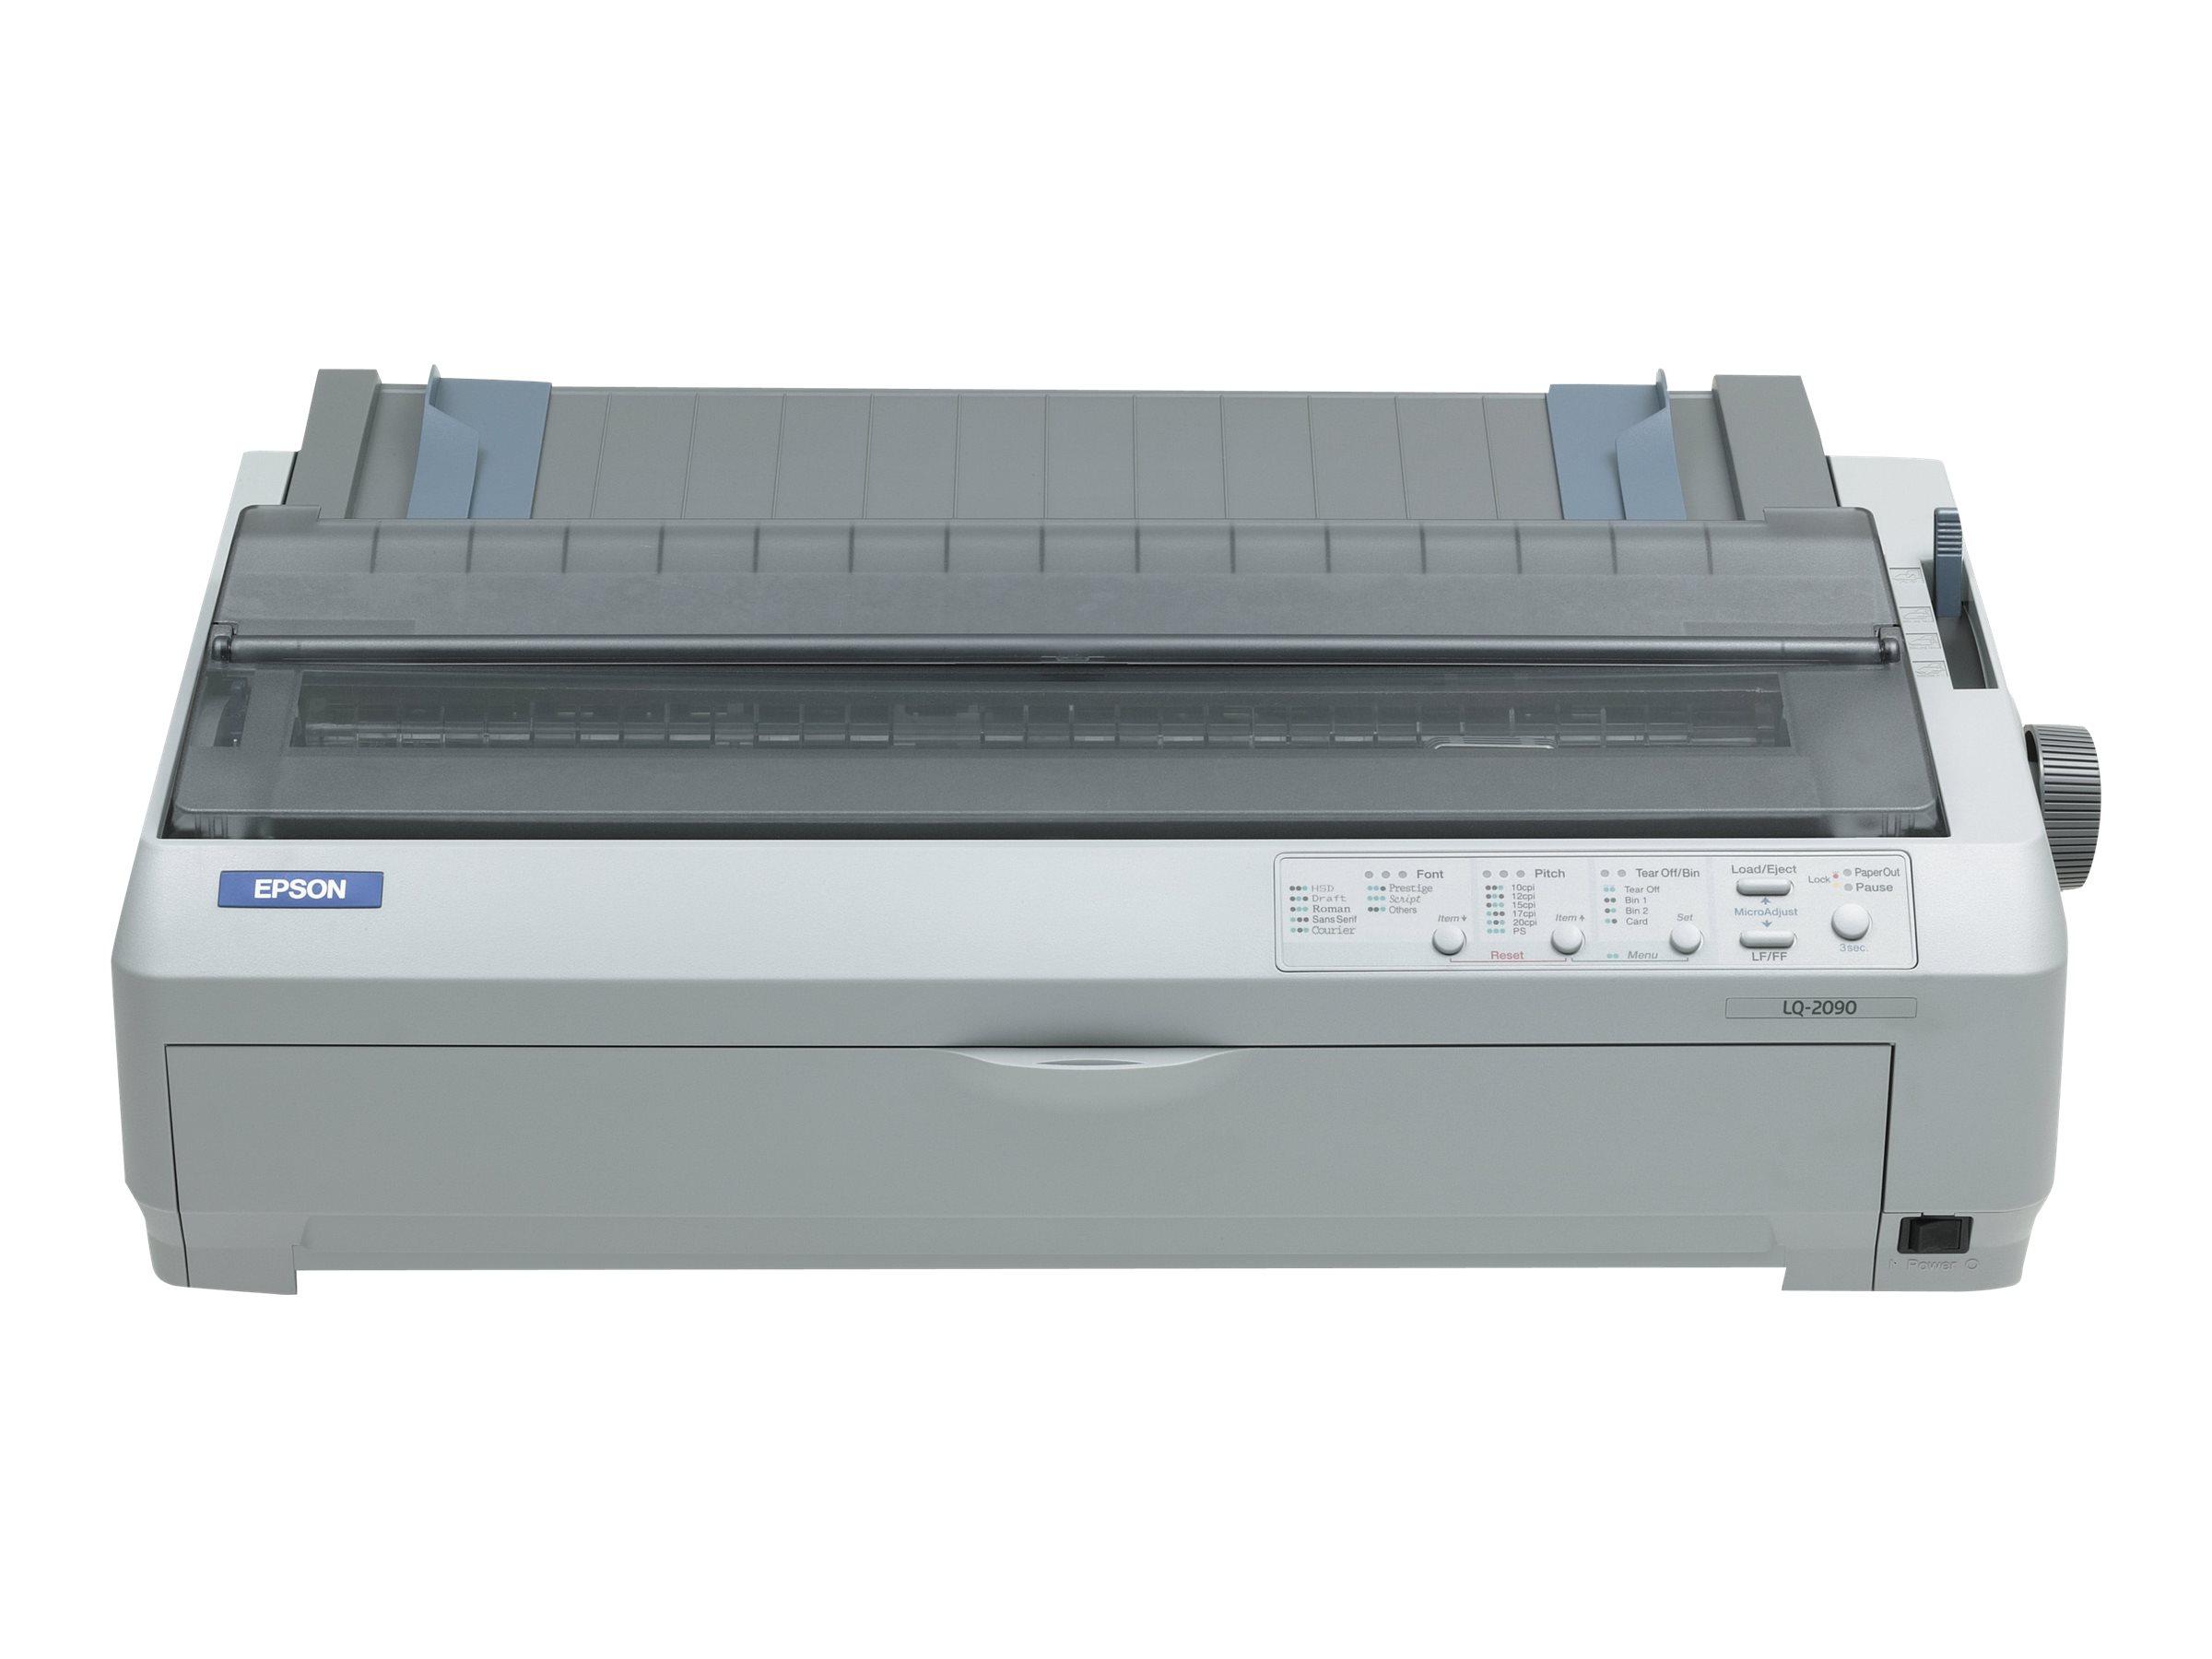 Epson LQ 2090 - Drucker - monochrom - Punktmatrix - 420 x 420 mm, 406 mm (Breite) - 360 x 180 dpi